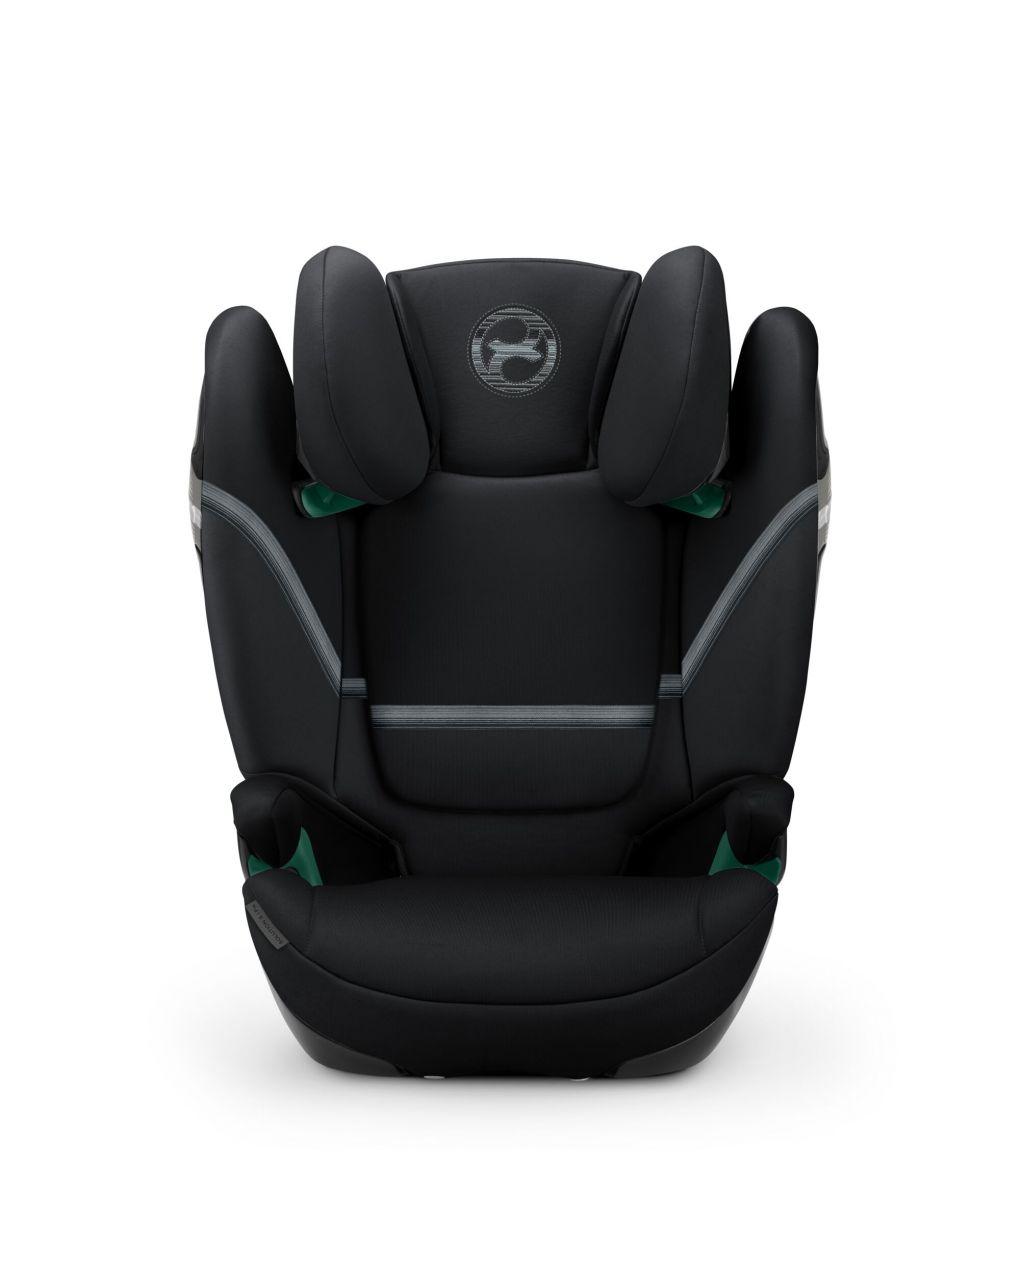 Cybex Κάθισμα Αυτοκινήτου Solution S2 i-FIX - Μαύρο